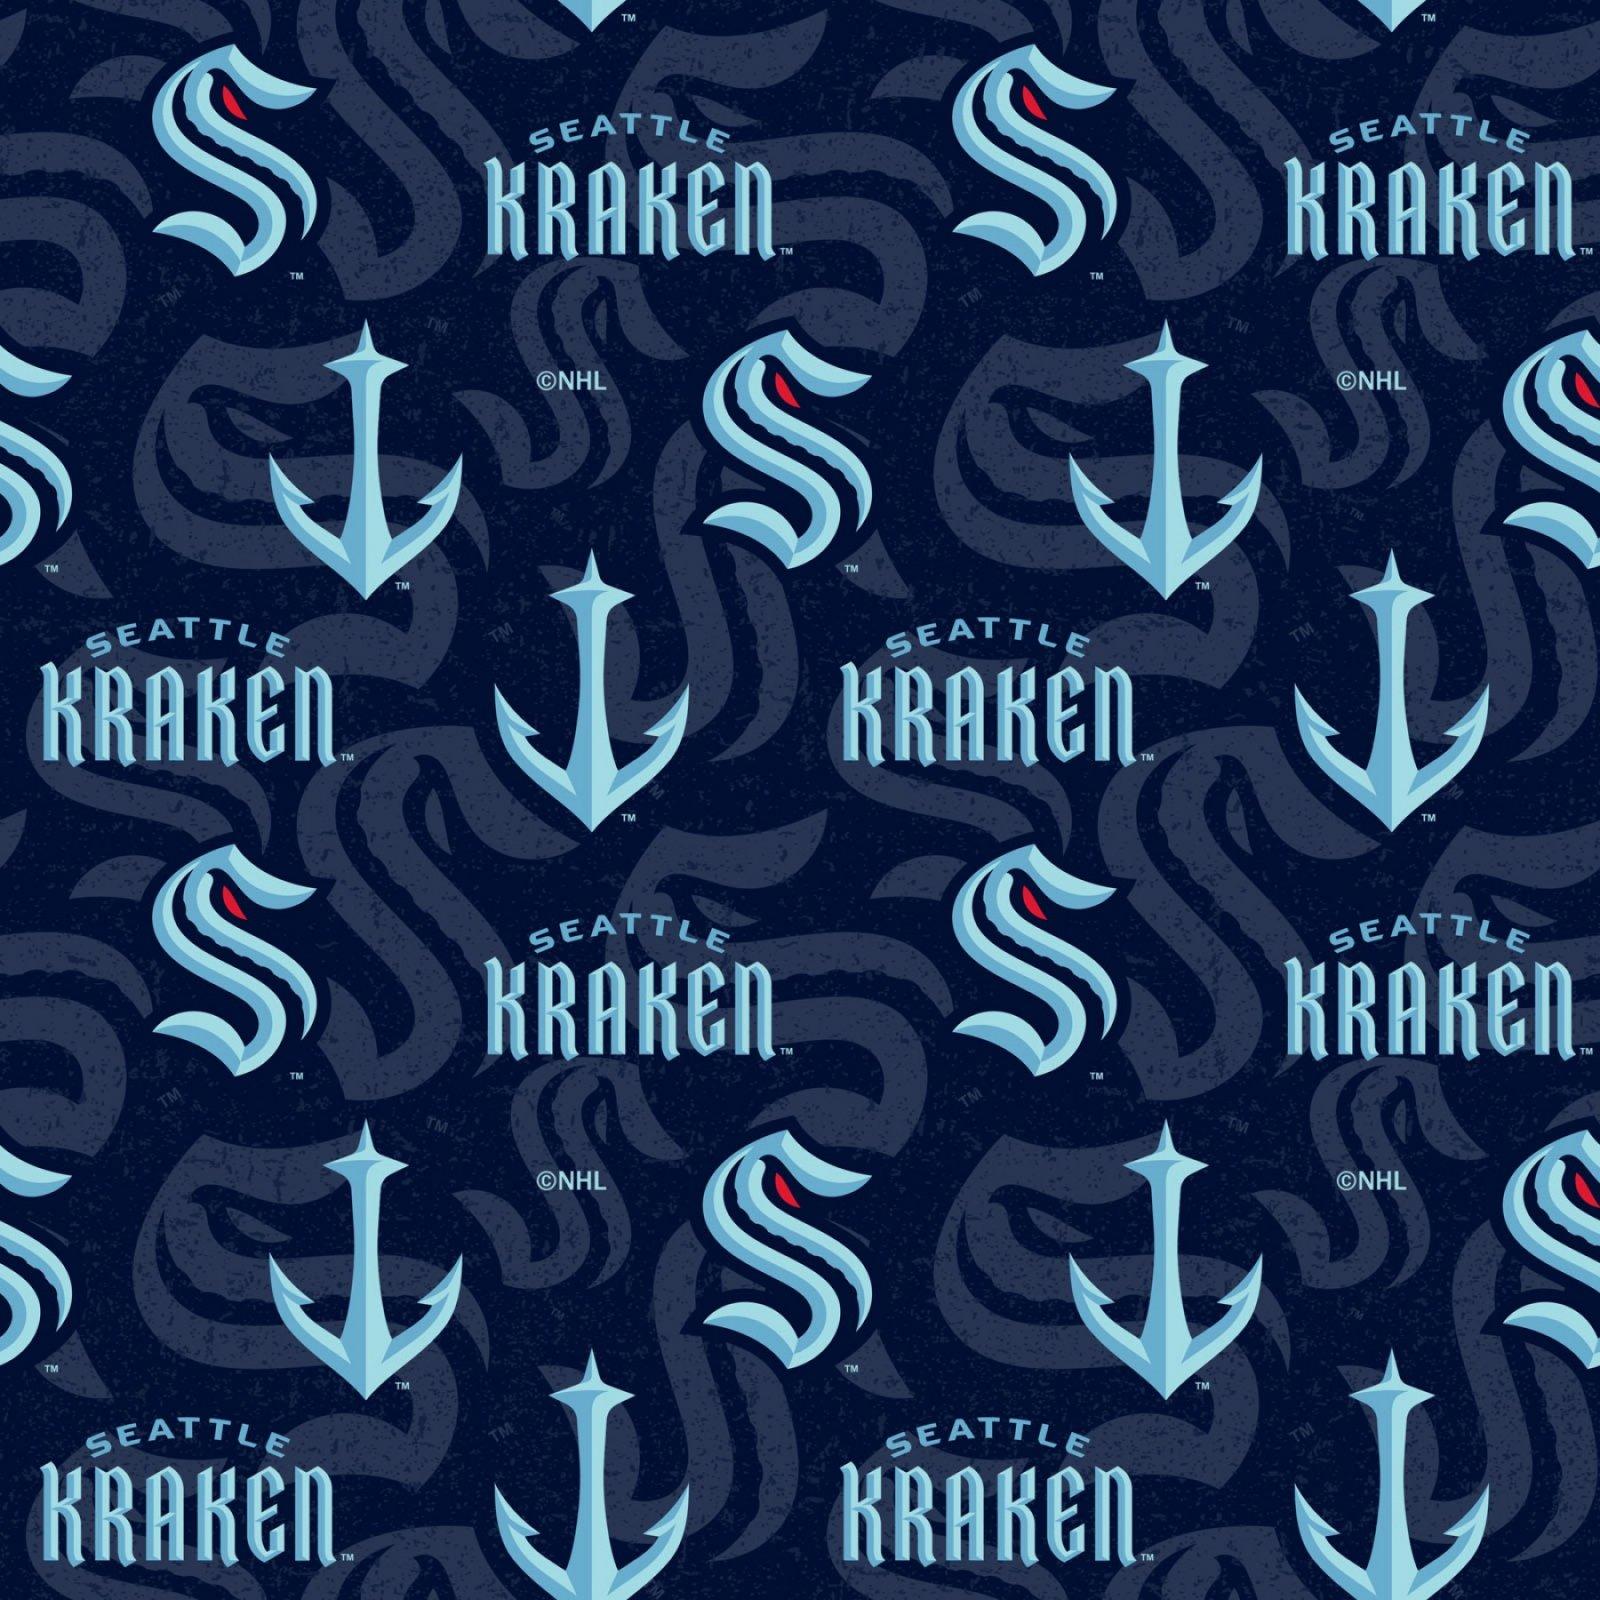 Seattle Kraken - Licensed 100% Cotton Fabric